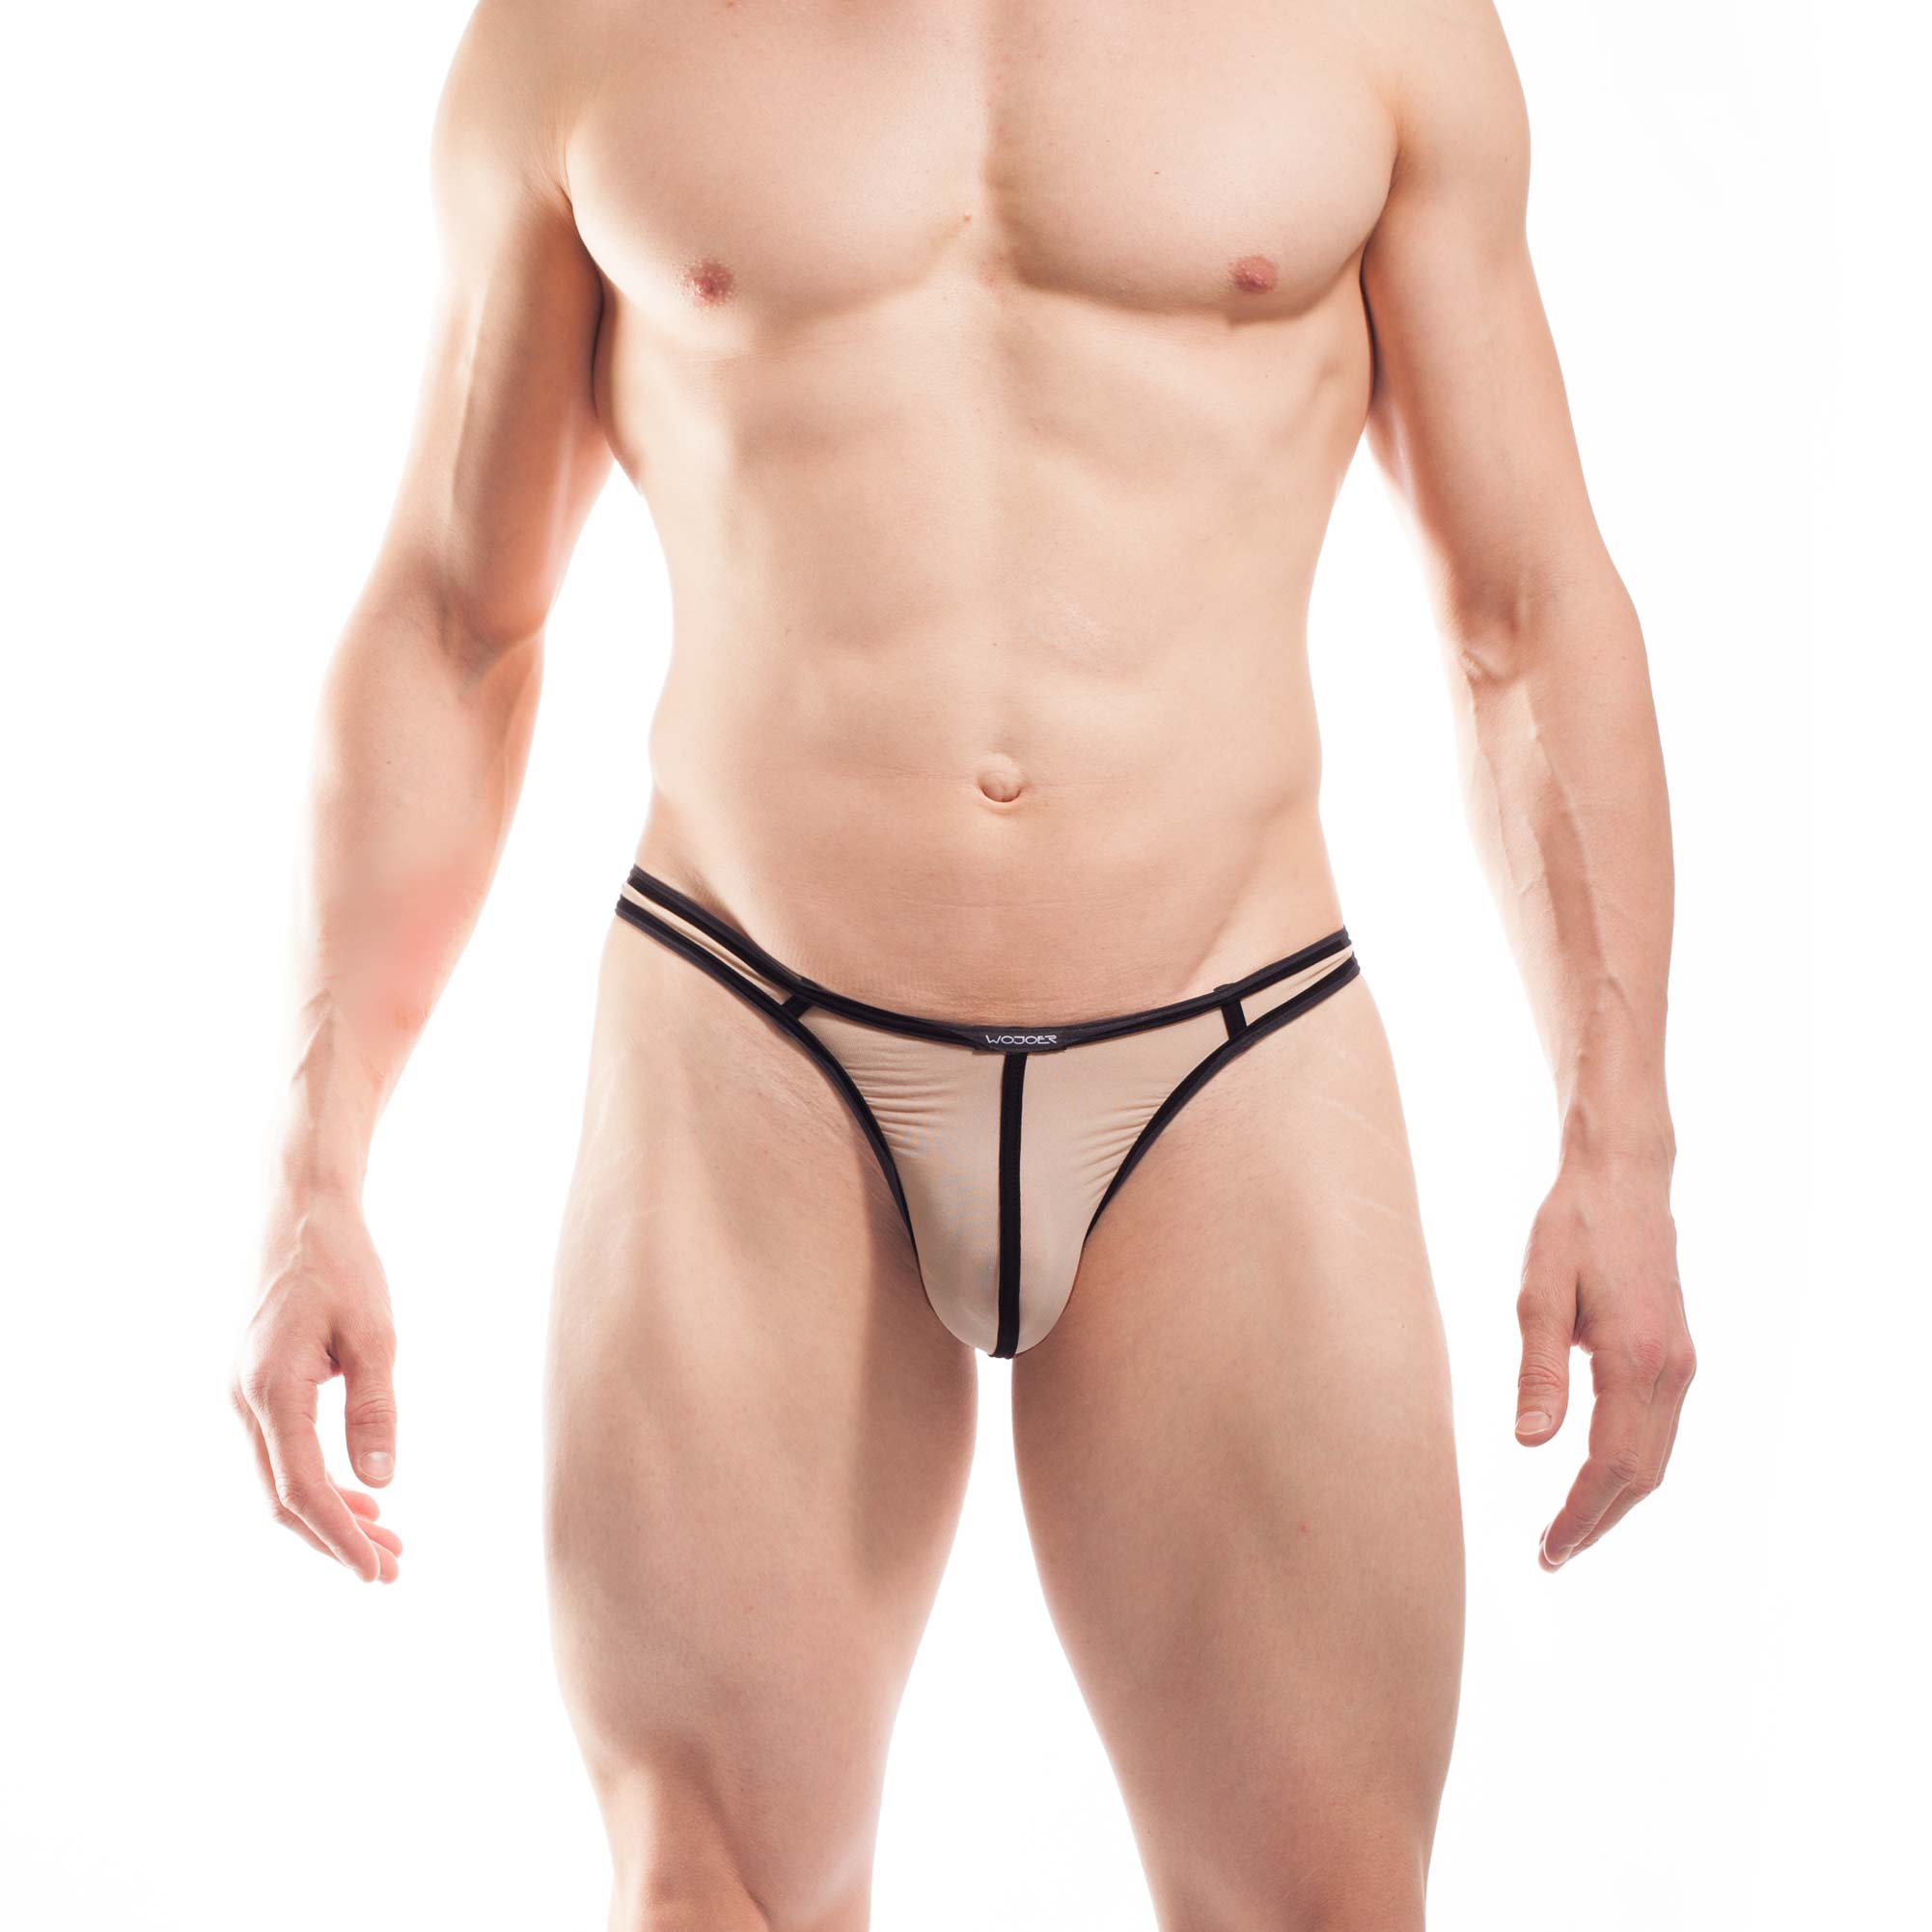 BEUN STRIPE STRING, Schmalissimo, string, knappe Badehose, swim trunks, kontrast Ränder, schwarze Börtchen, hautfarben, nude, haut